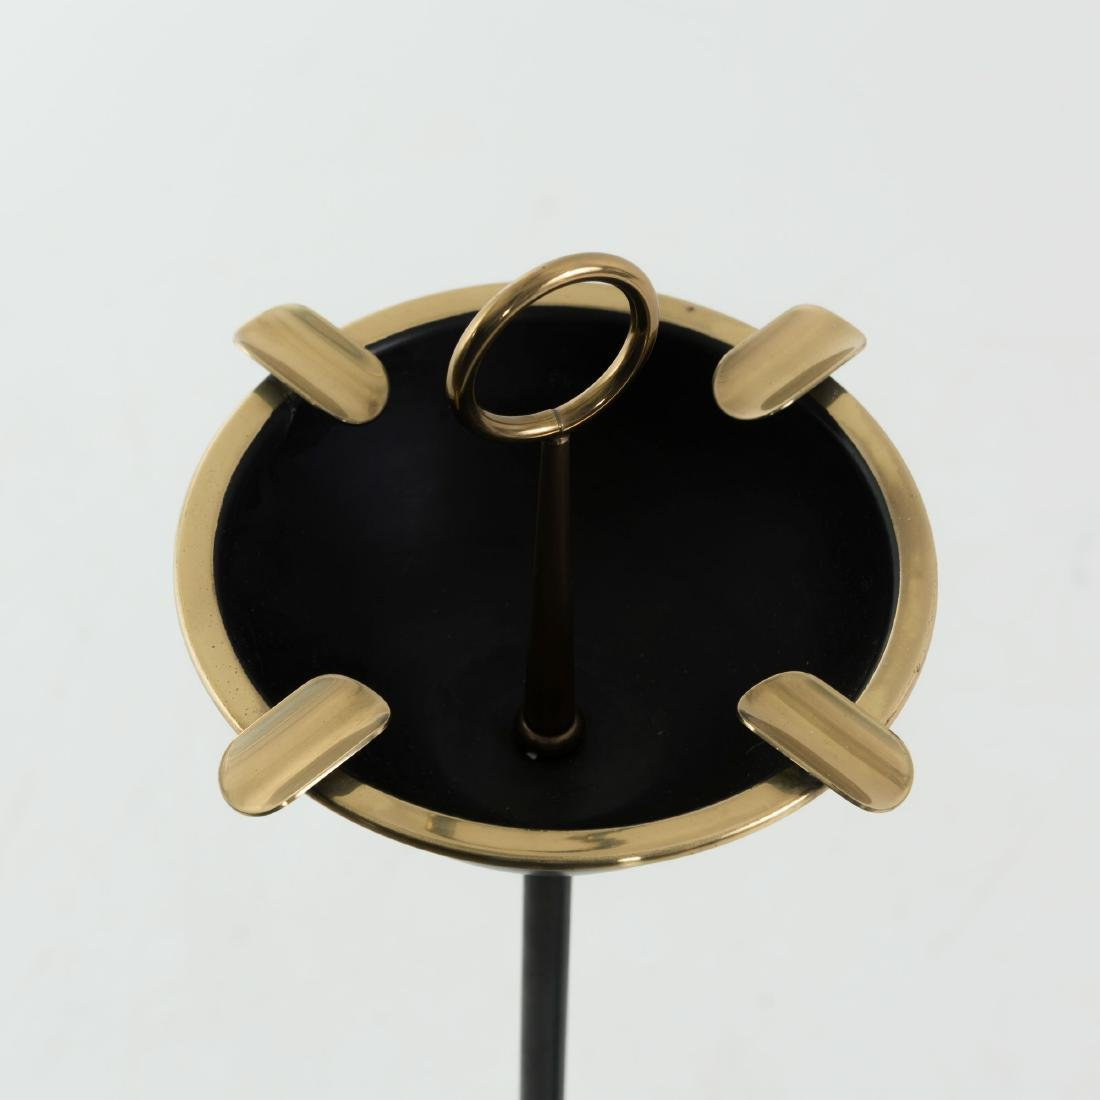 Two standard ashtrays, c. 1955 - 2